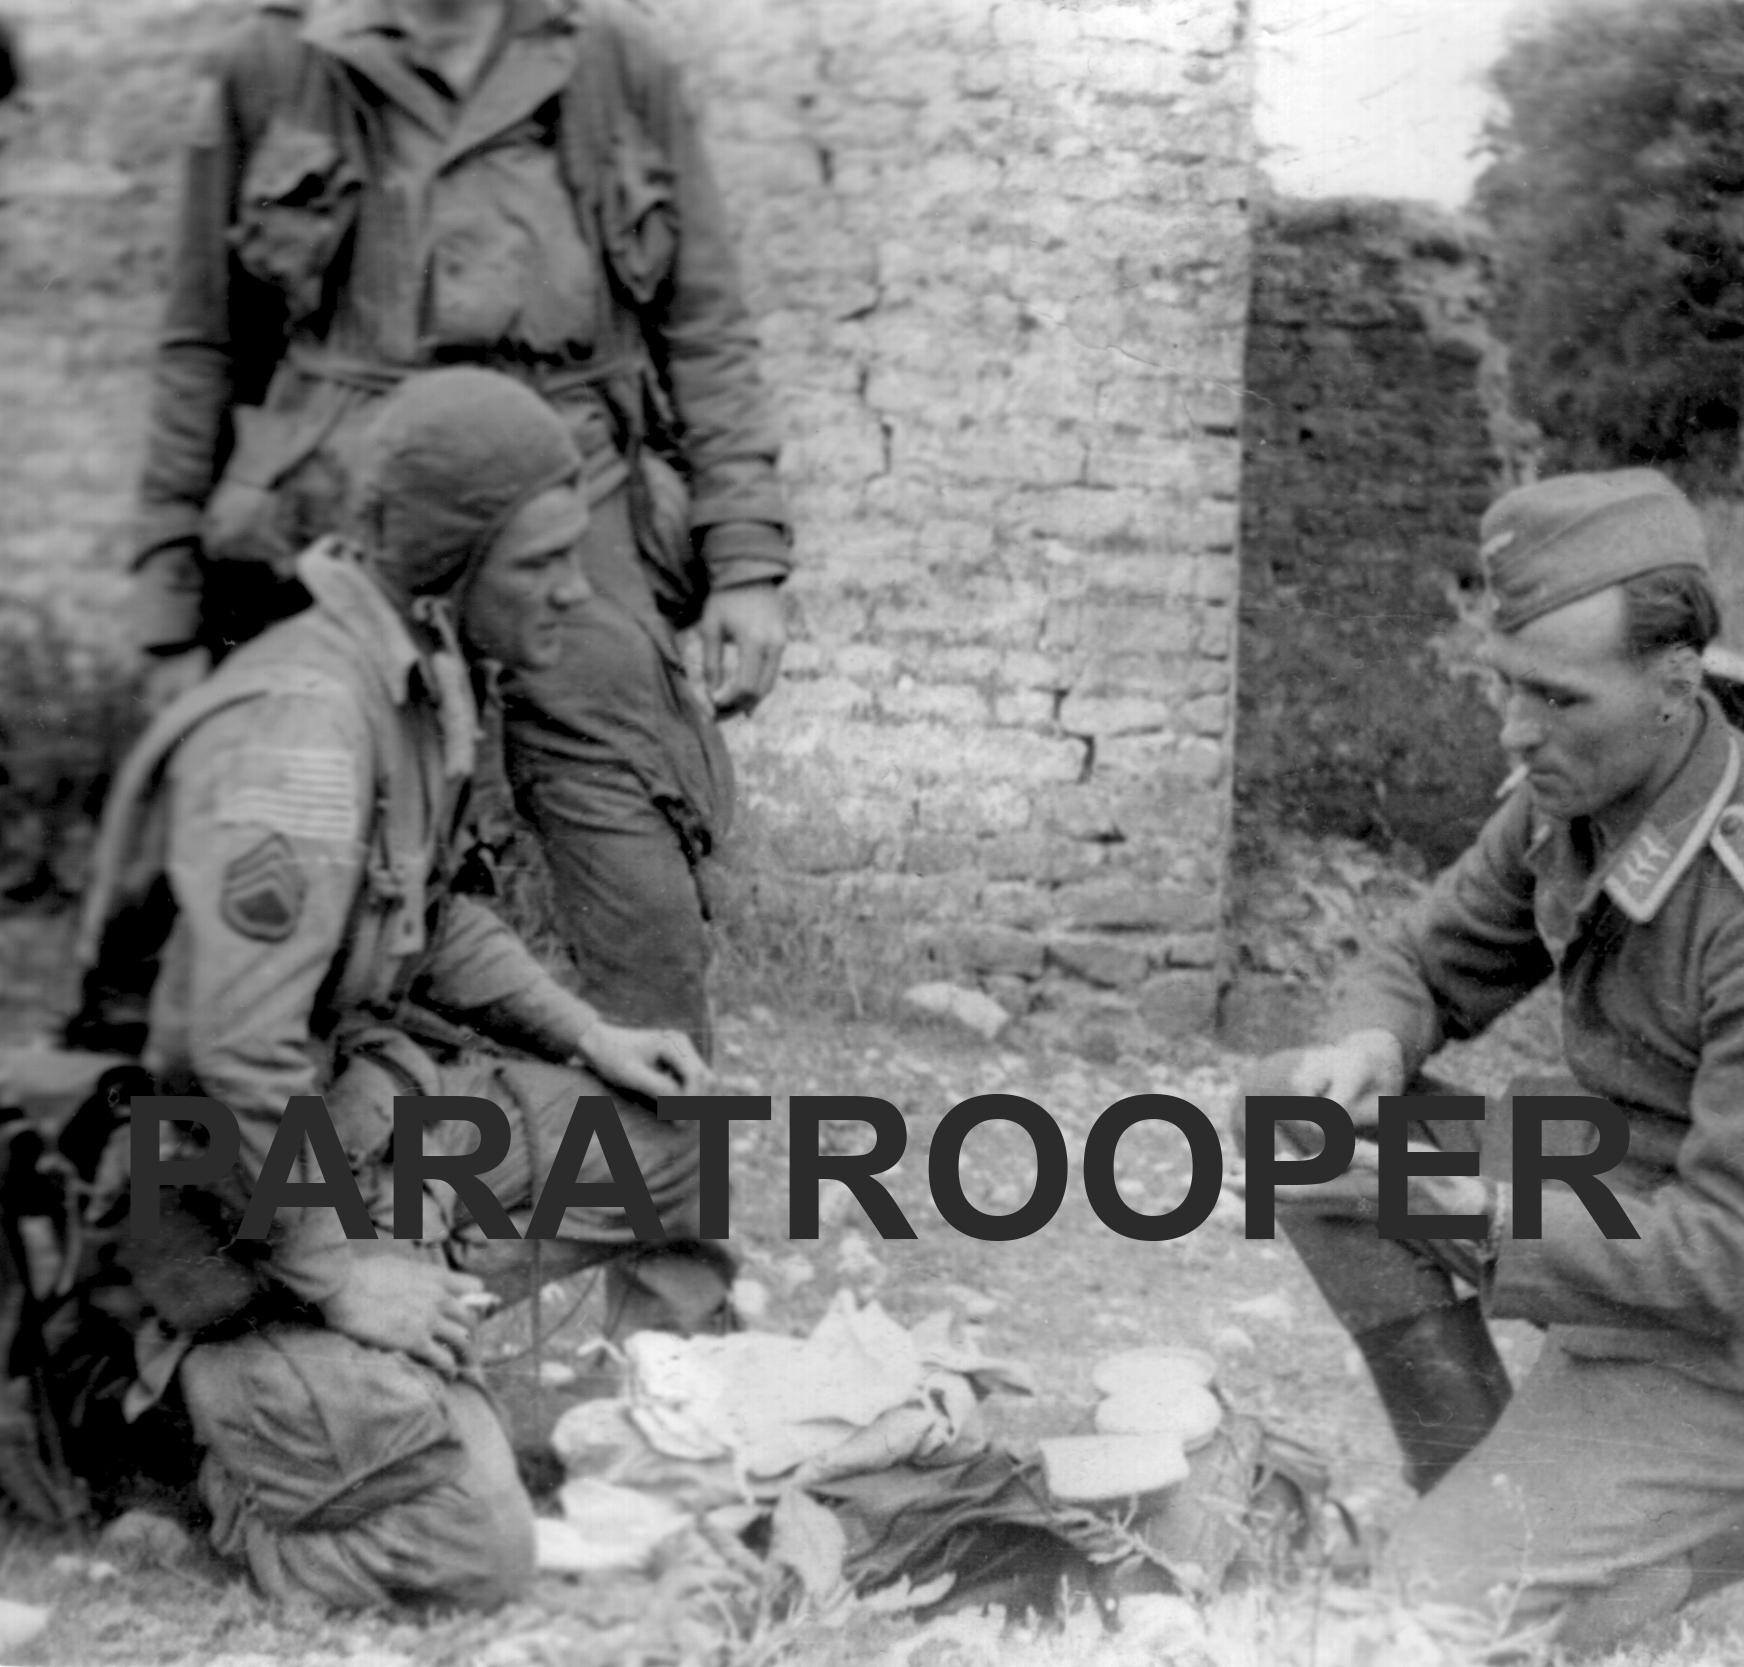 A_8 helmet paratrooper